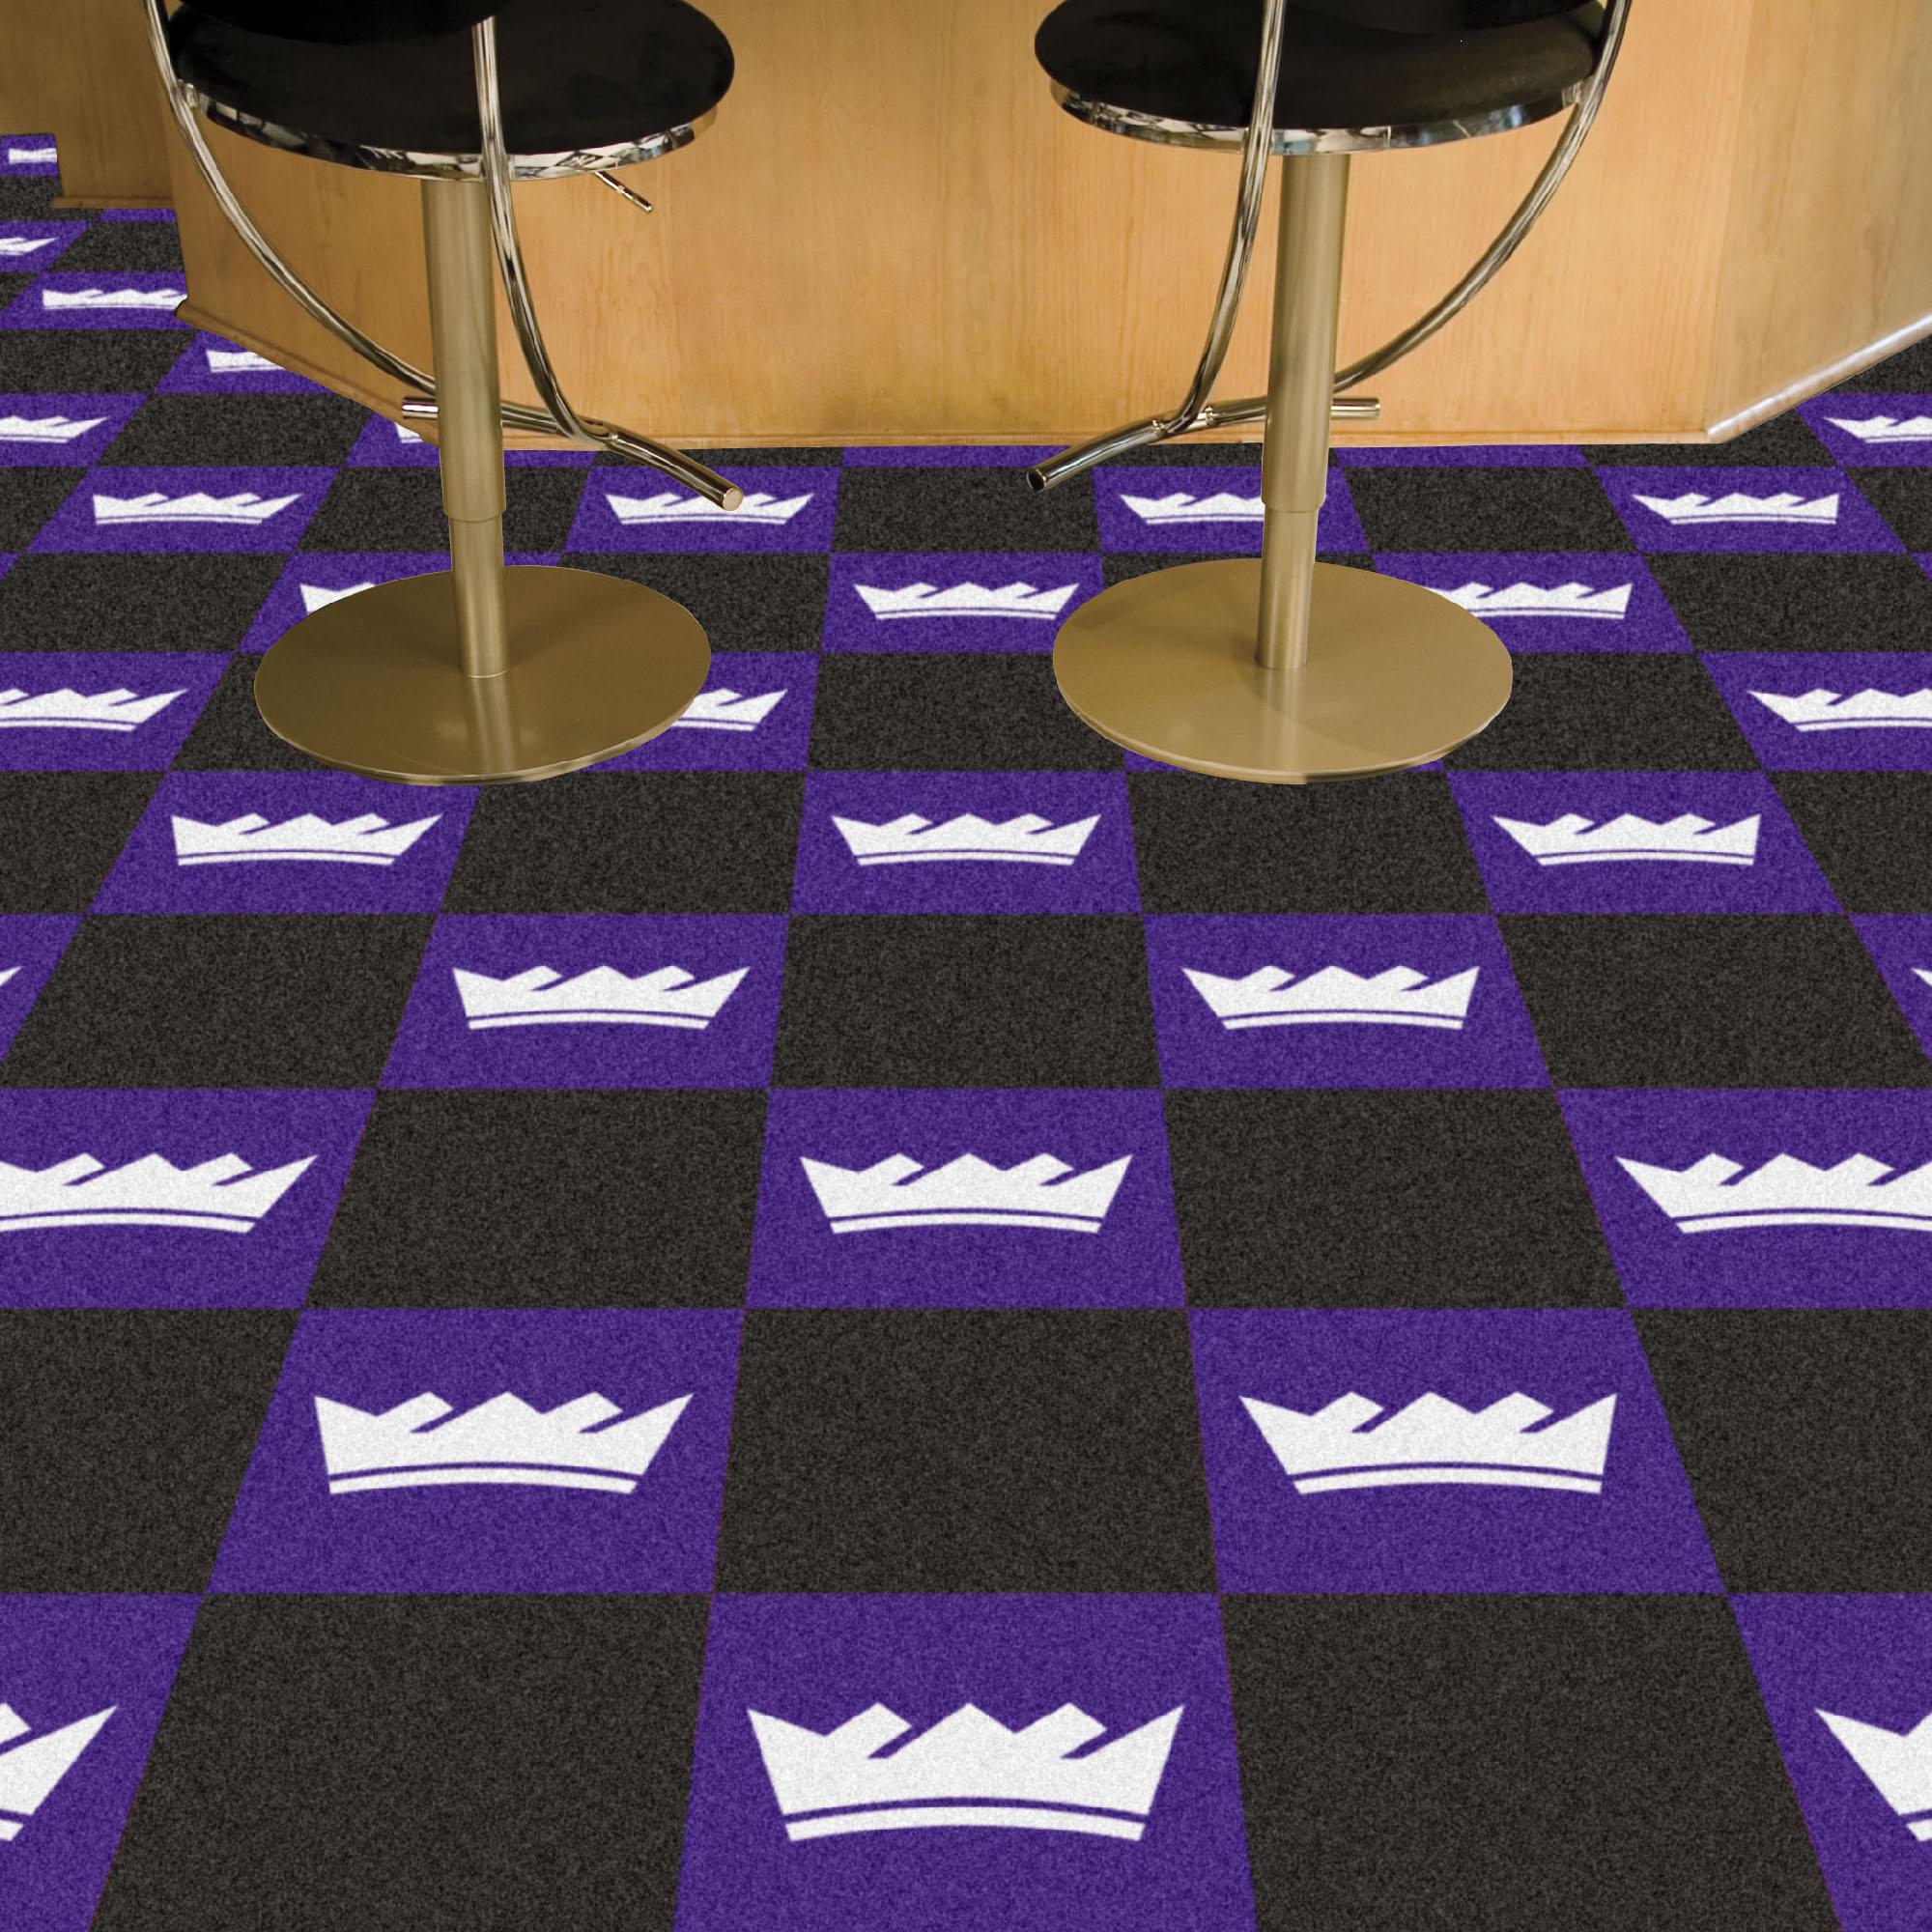 Sacramento Kings Carpet Tiles 18x18 In Buy At Khc Sports